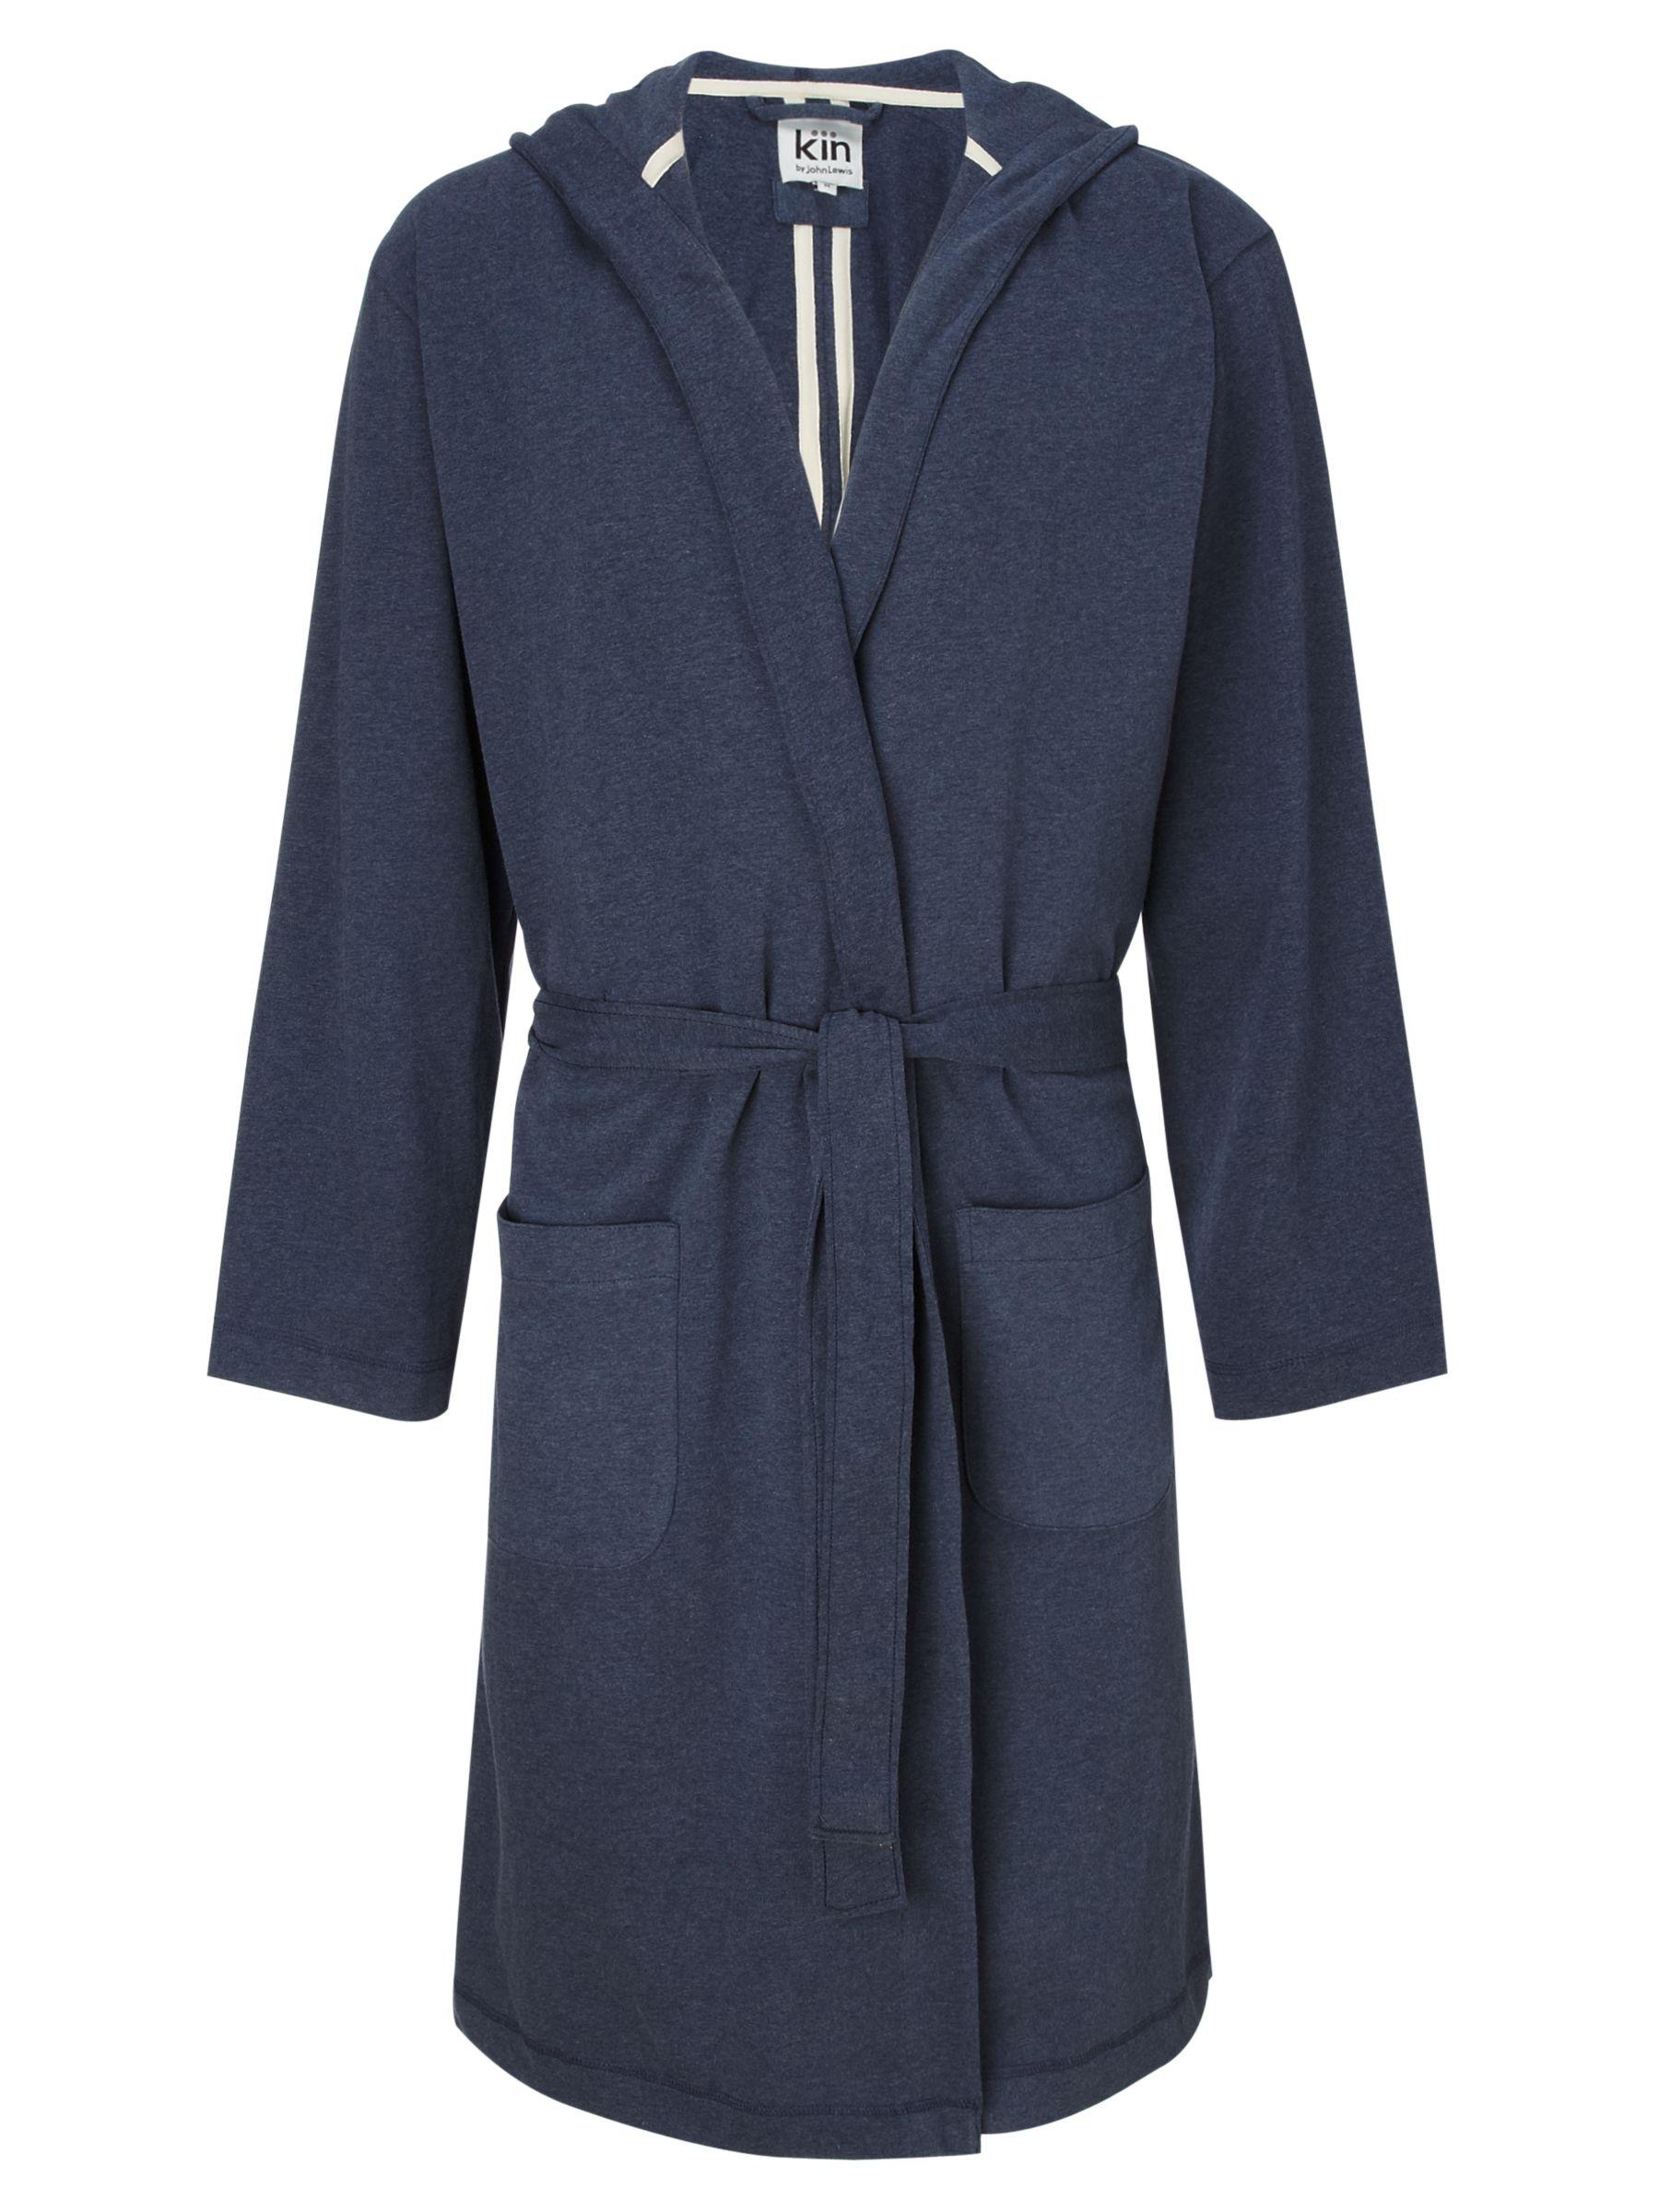 Kin by John Lewis Marl Jersey Robe, Navy